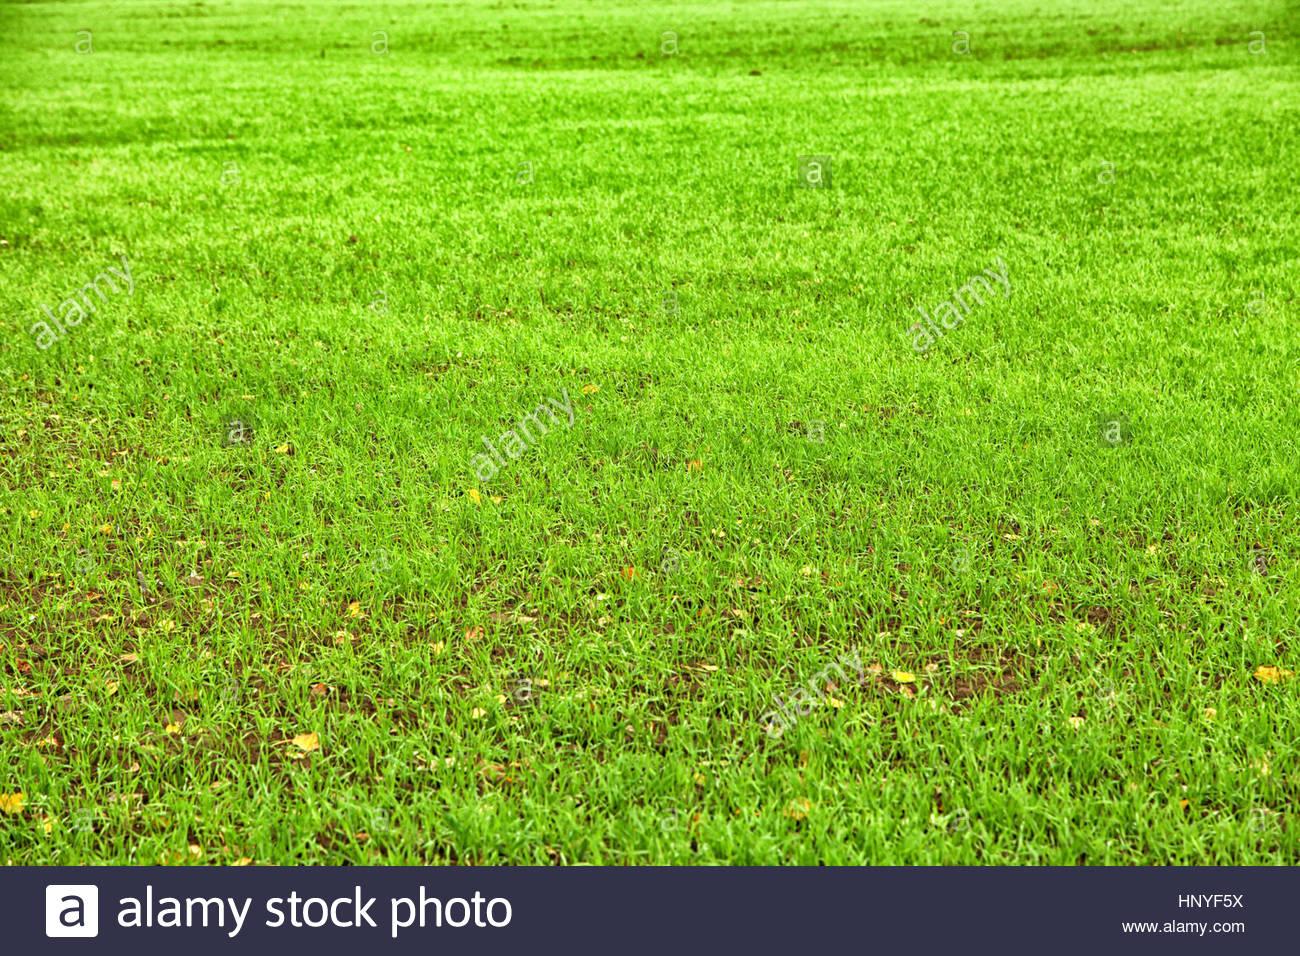 Kelly green lawn background Stock Photo 133984982   Alamy 1300x956